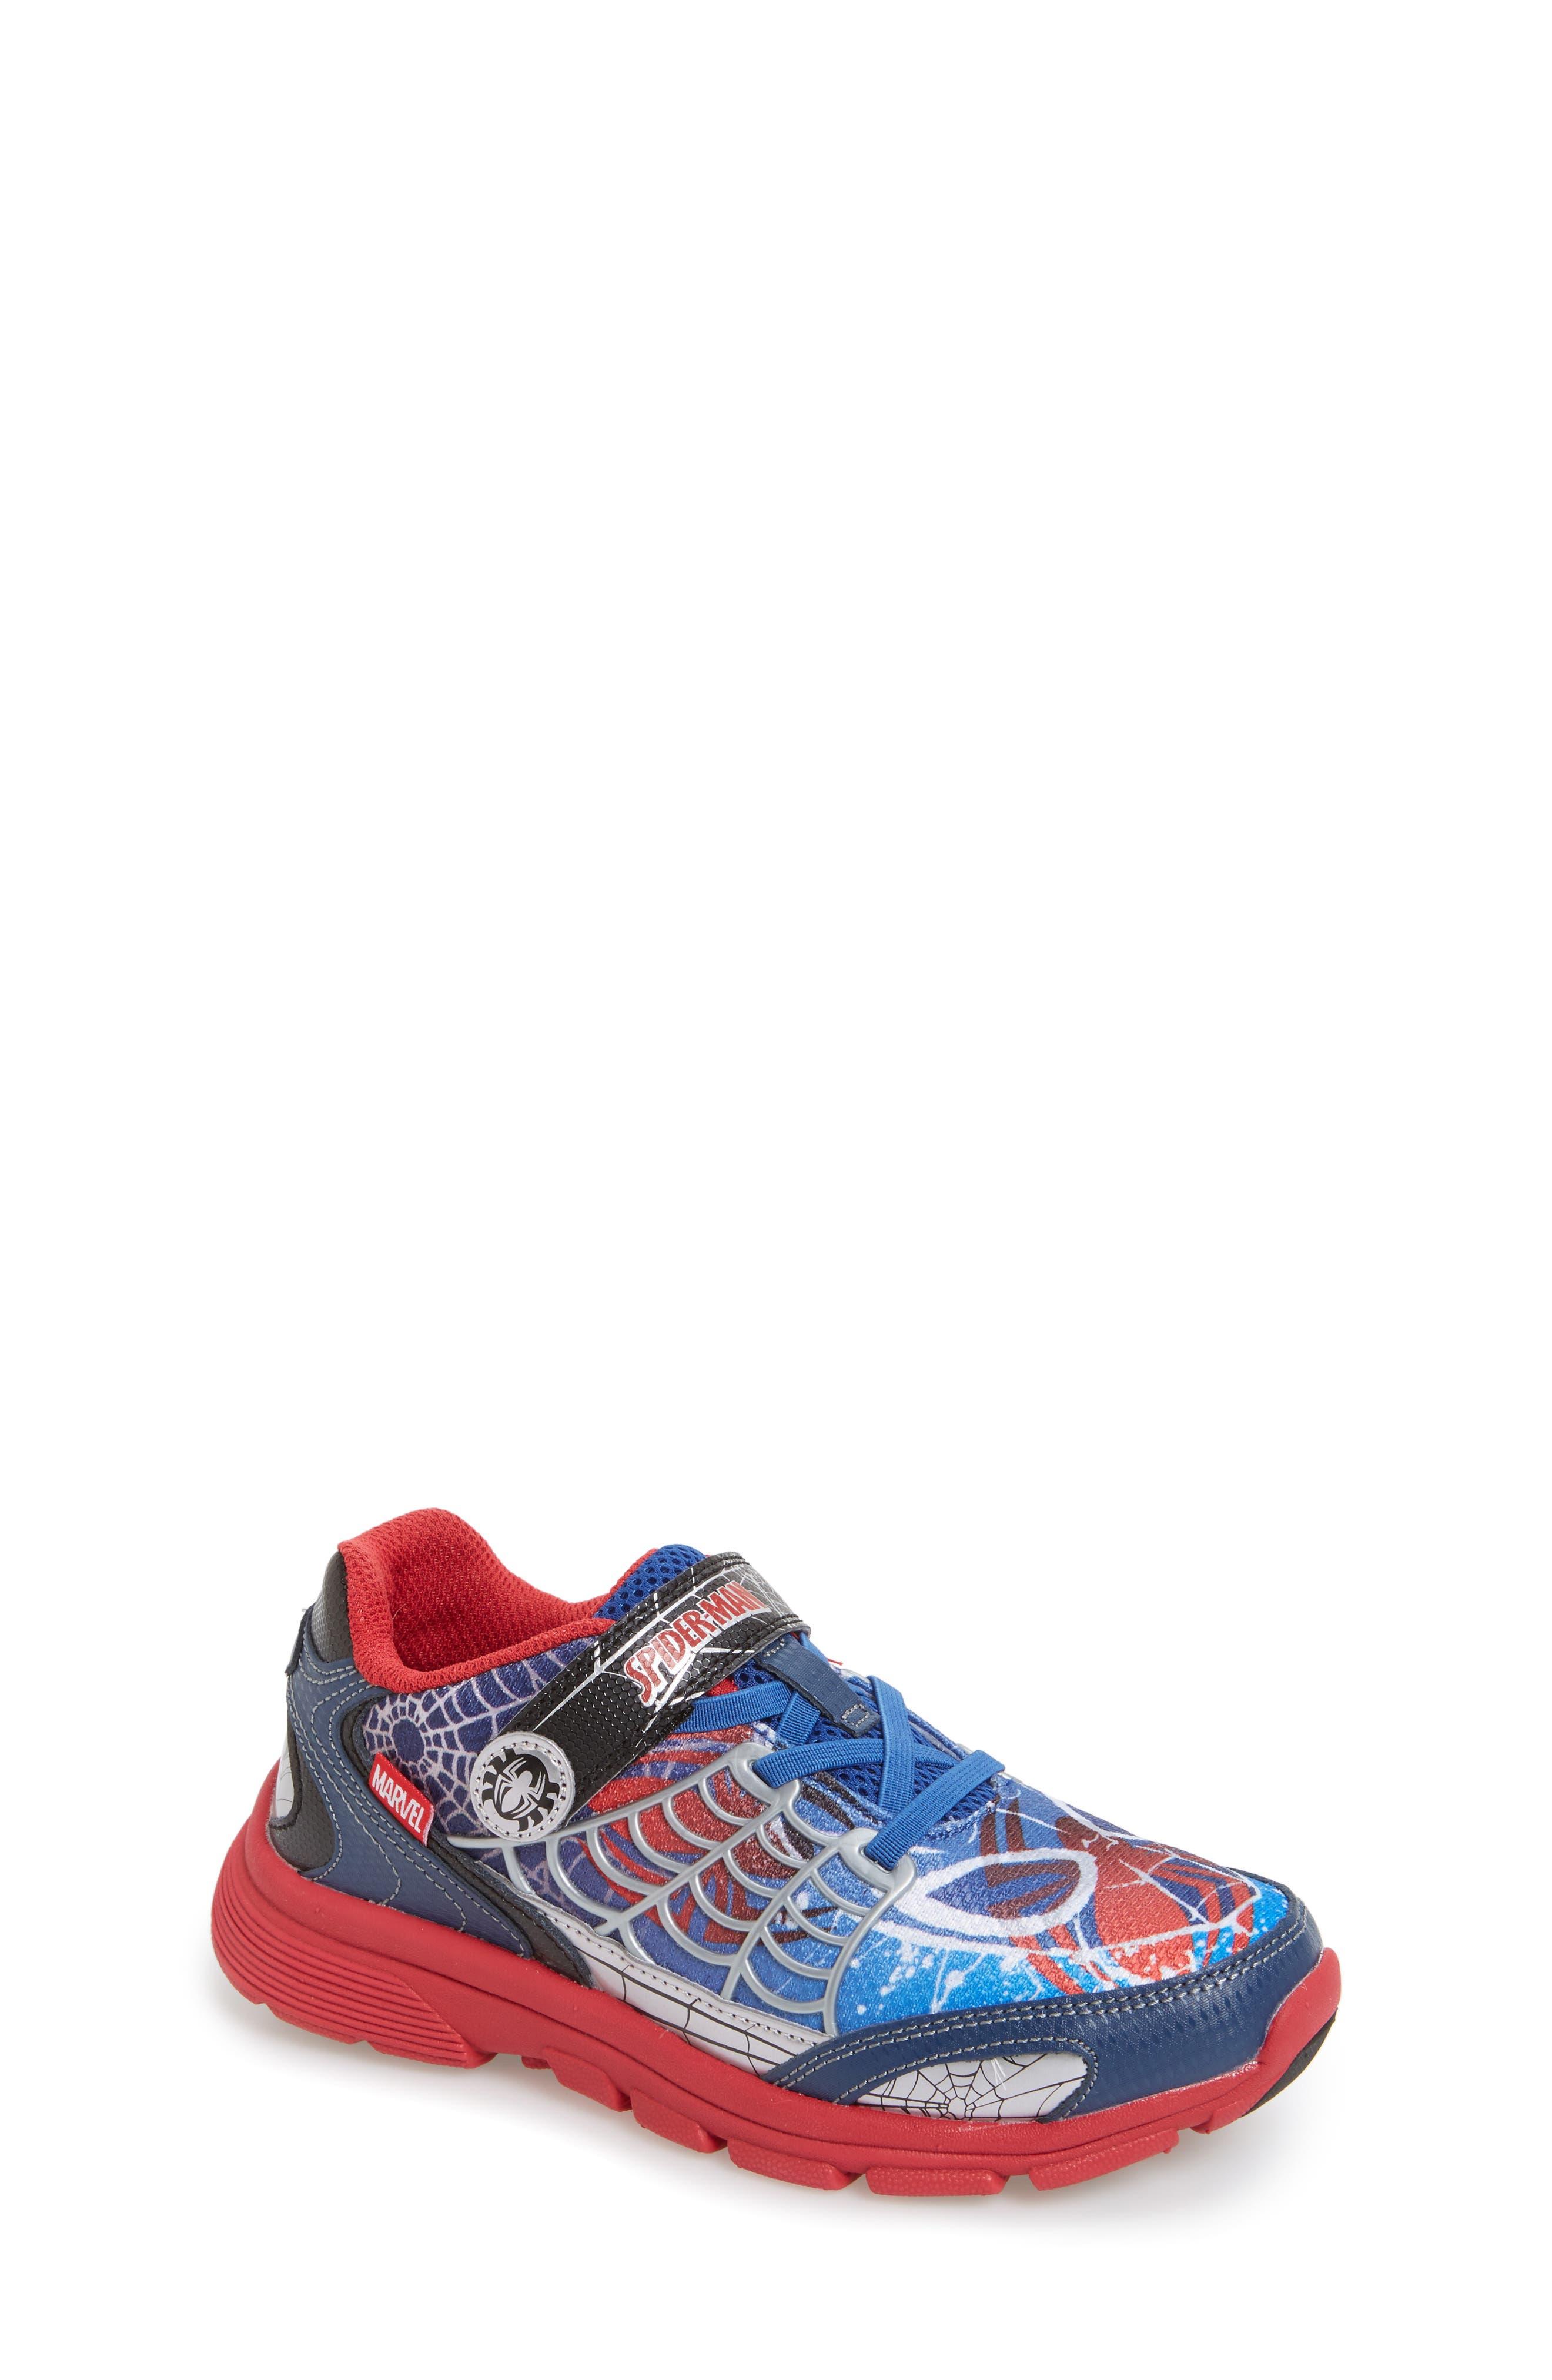 Spidey Sense Light-Up Sneaker,                         Main,                         color,